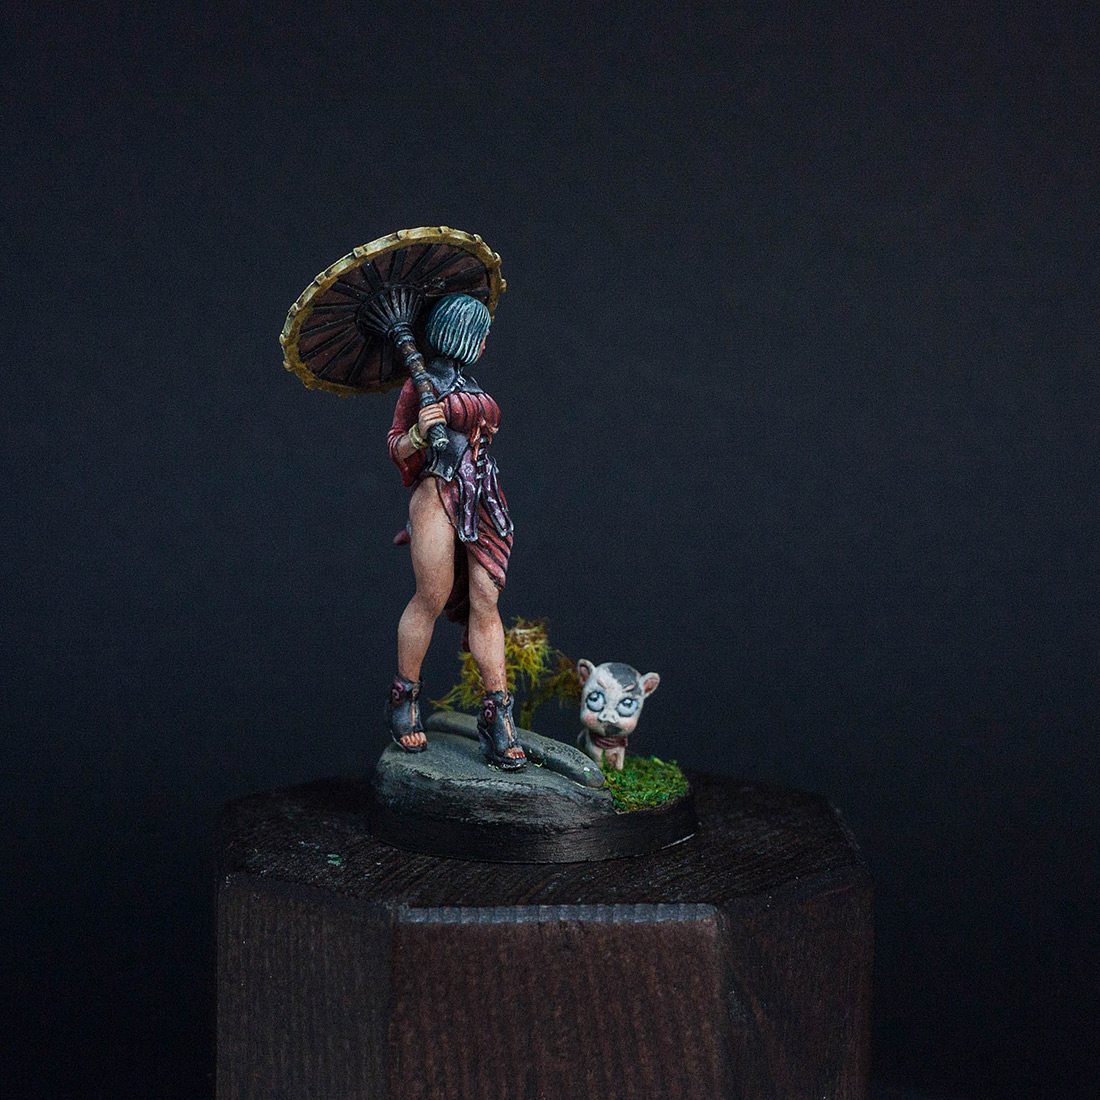 Miscellaneous: Lady Dragon, photo #1